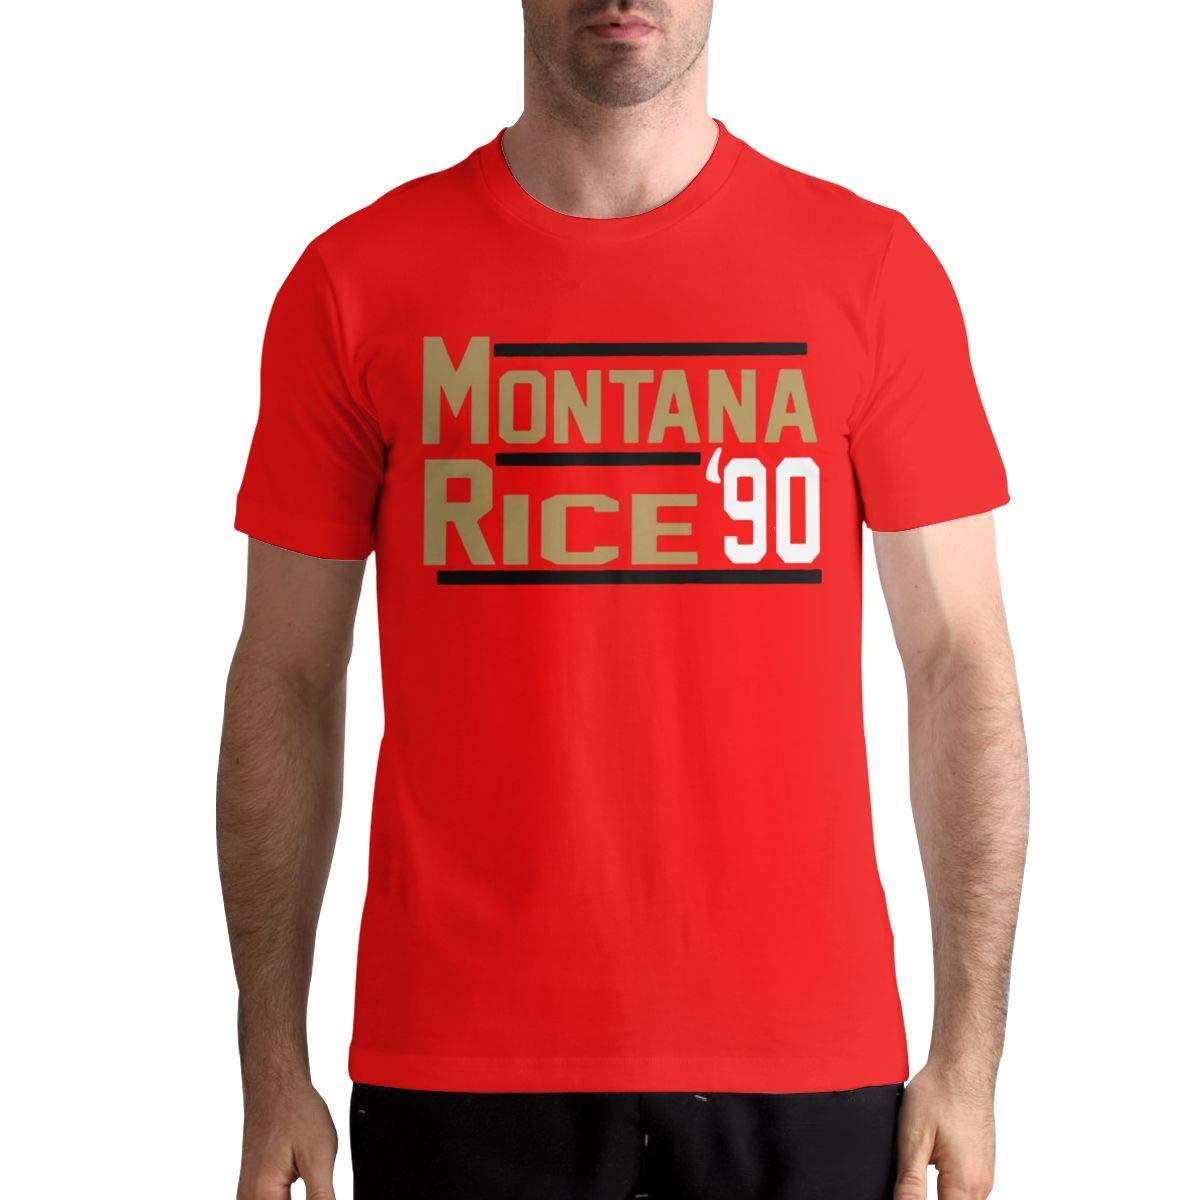 Lindadfeeney Montana Rice S Trend T Shirts Athletic